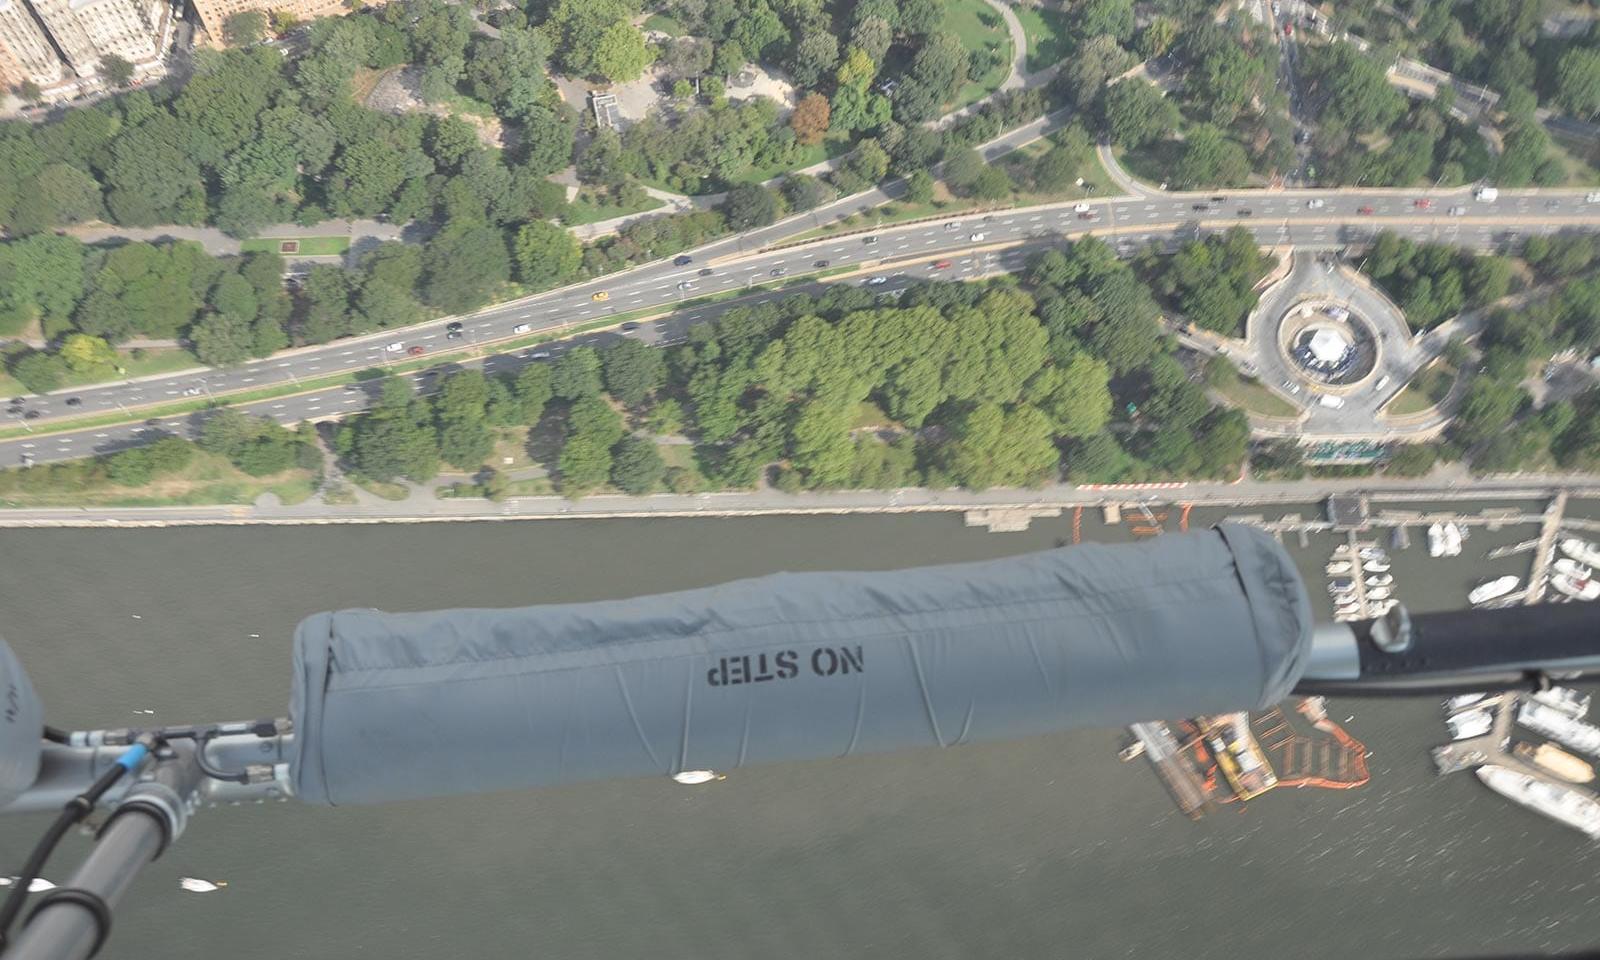 Helikopterflug New York Bilder 14